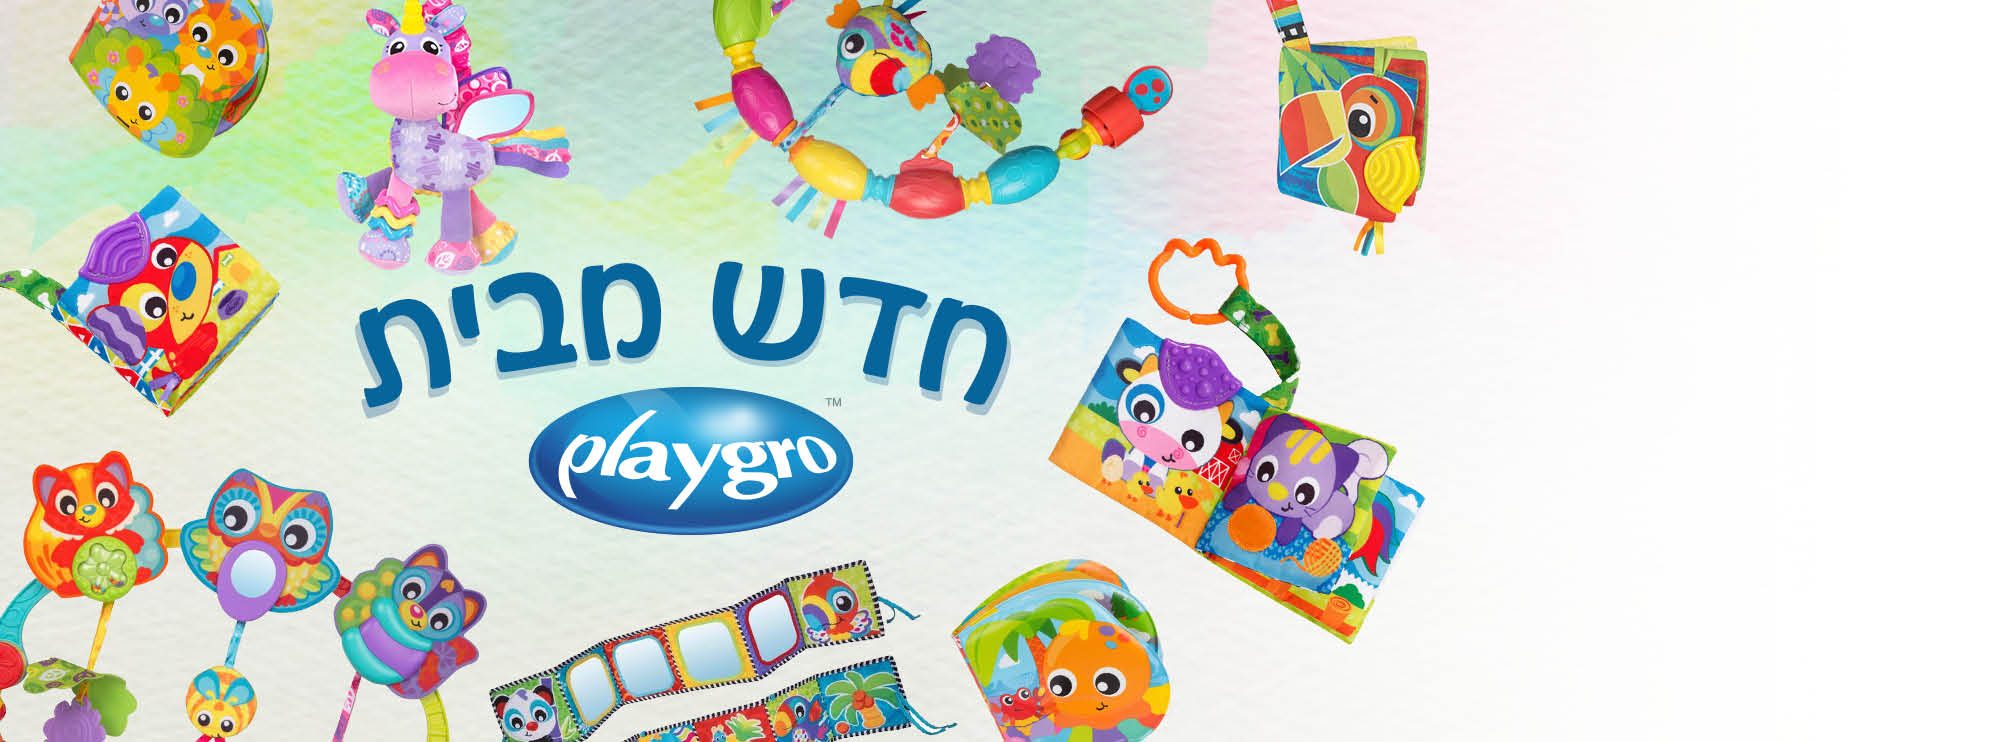 14 2 2 toys2 2, מכוניות לילדים, יצירות, משחקים לבנות, משחקי חשיבה